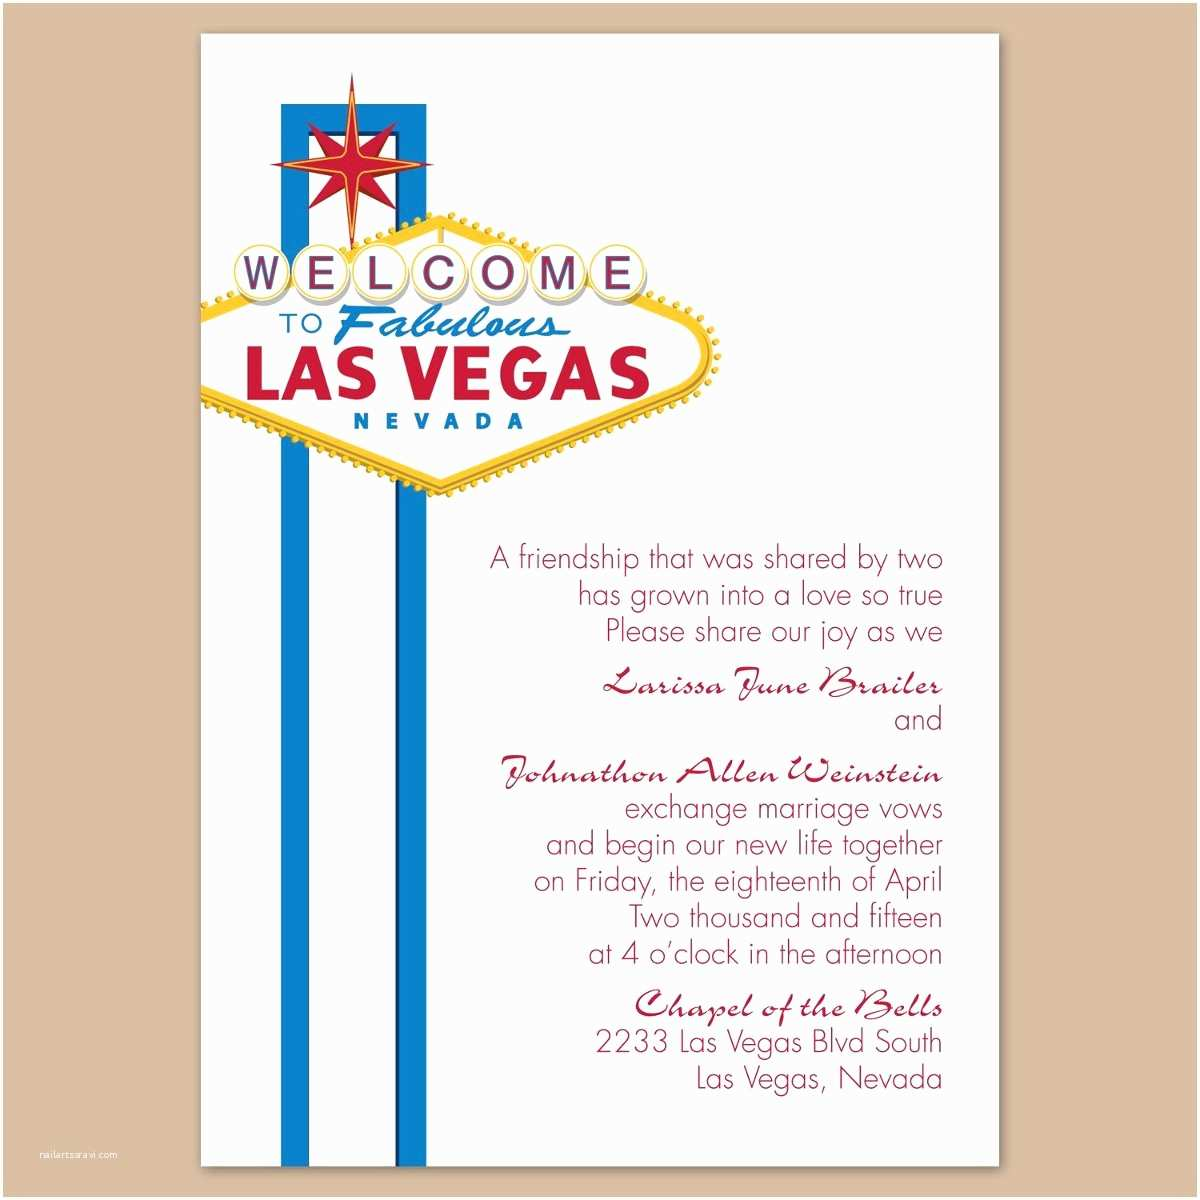 Las Vegas Wedding Invitations Las Vegas Wedding Invitations Free